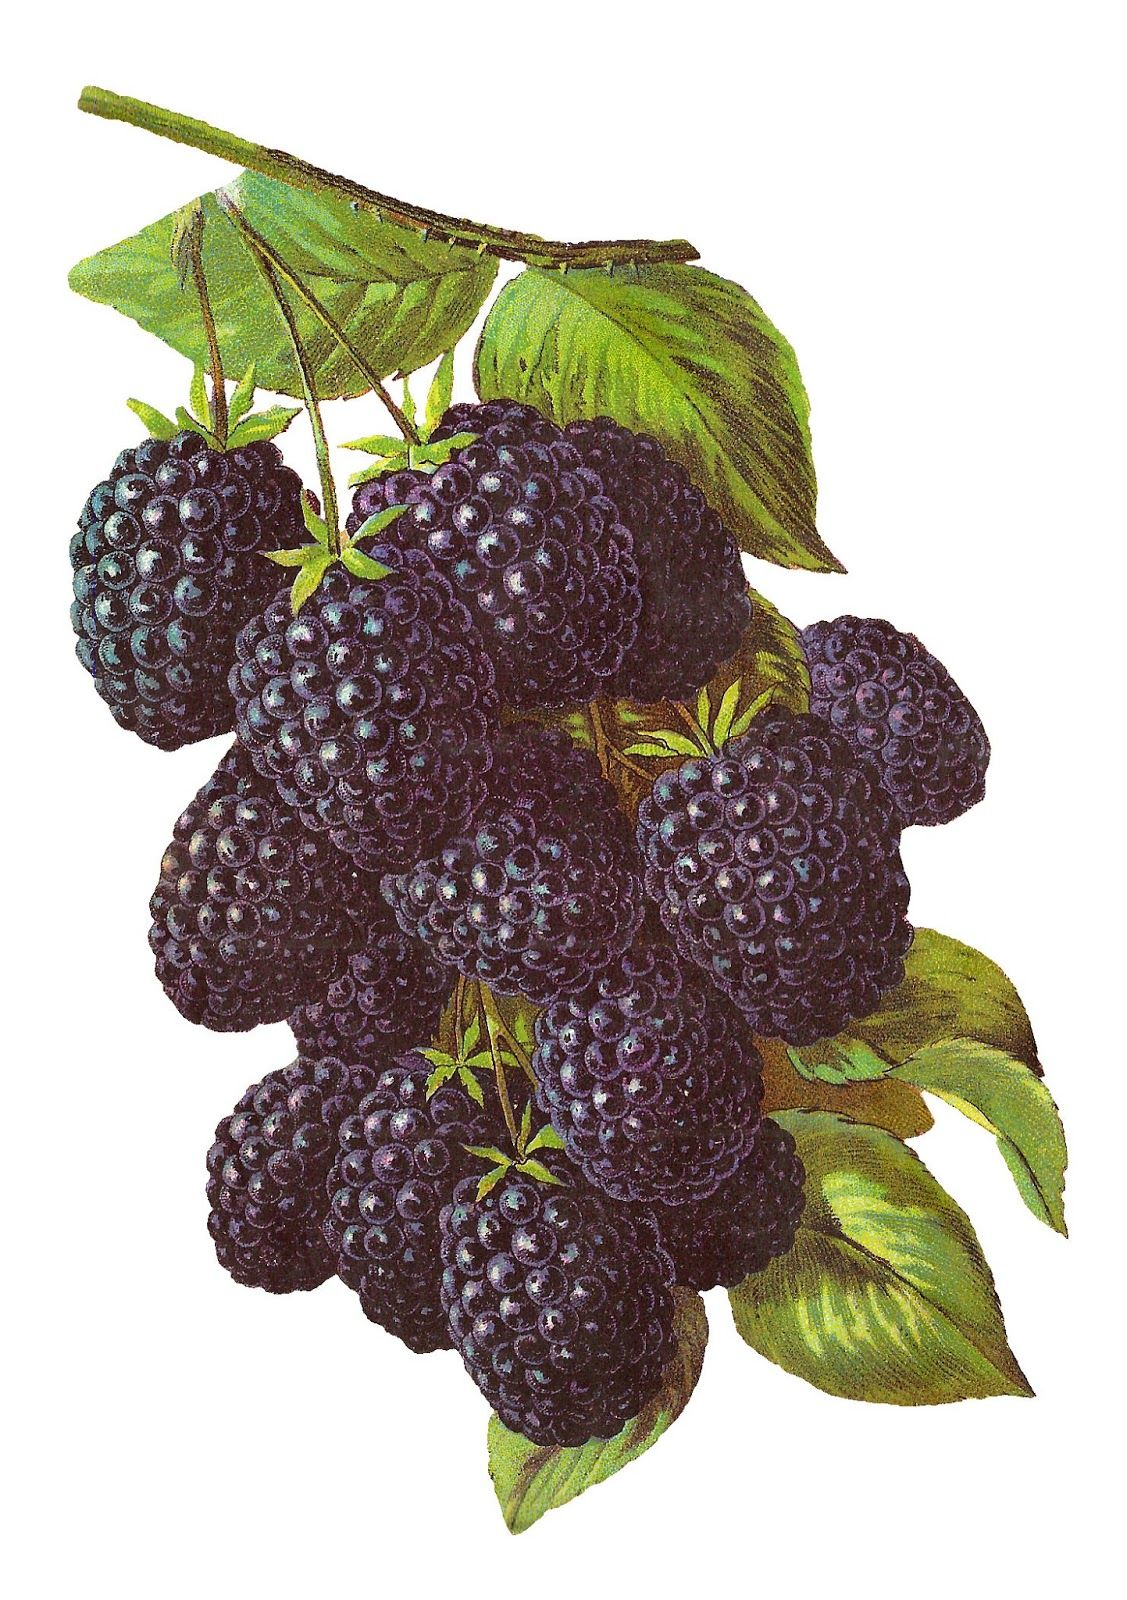 Antique Images: blackberries.